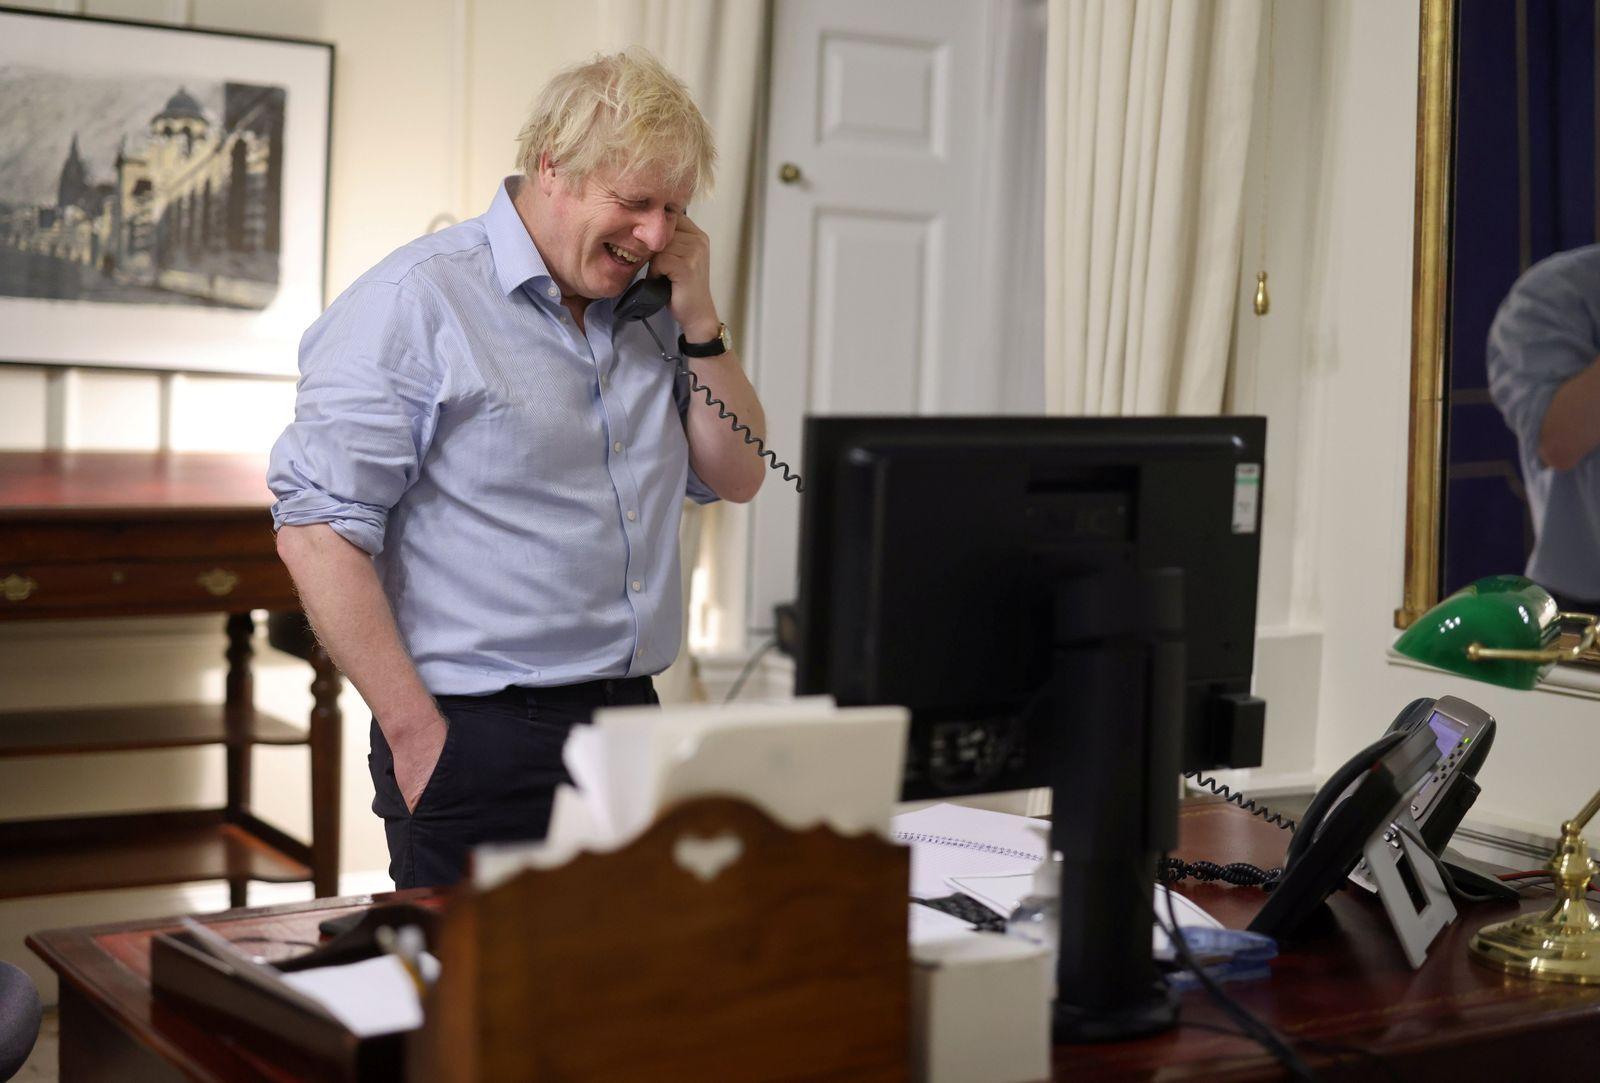 British PM Johnson speaks to U.S. President Biden from London